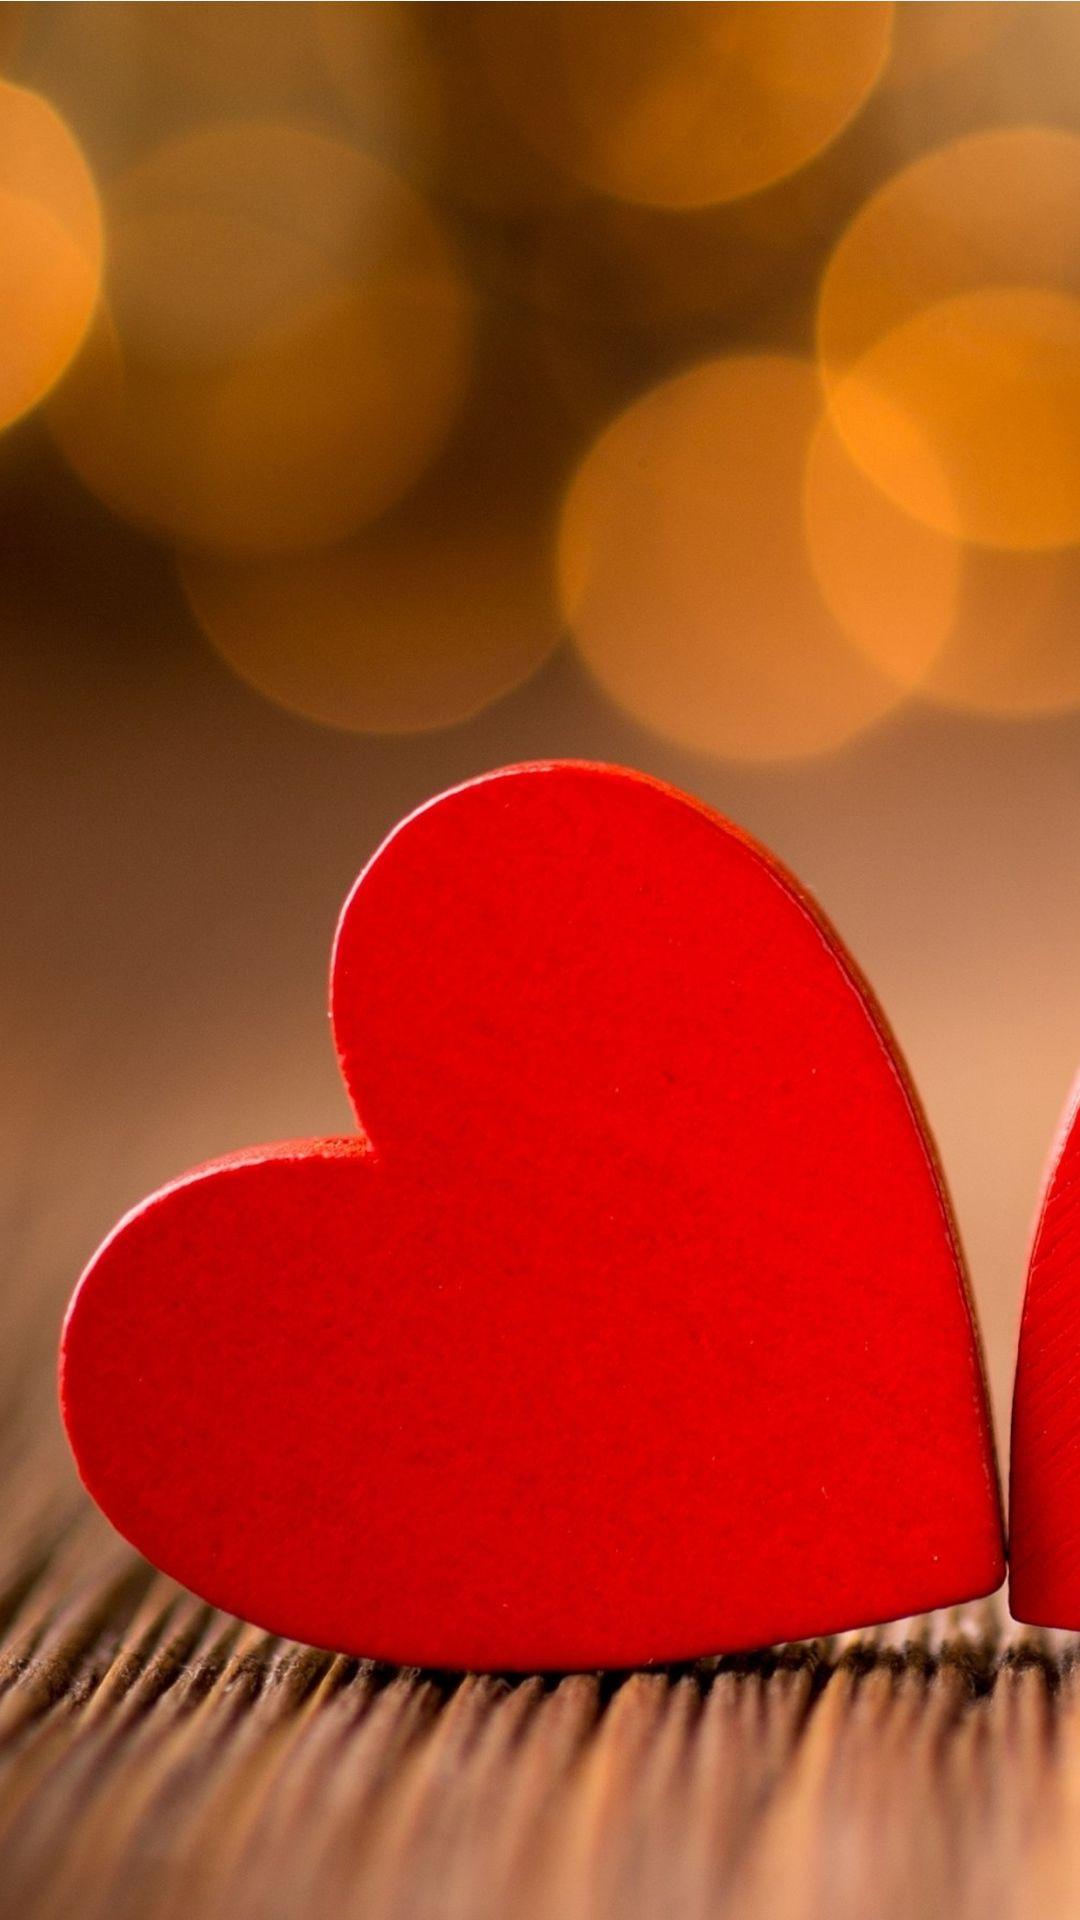 Black Heart Iphone Wallpaper Heart Iphone Wallpaper Heart Wallpaper Dark Wallpaper